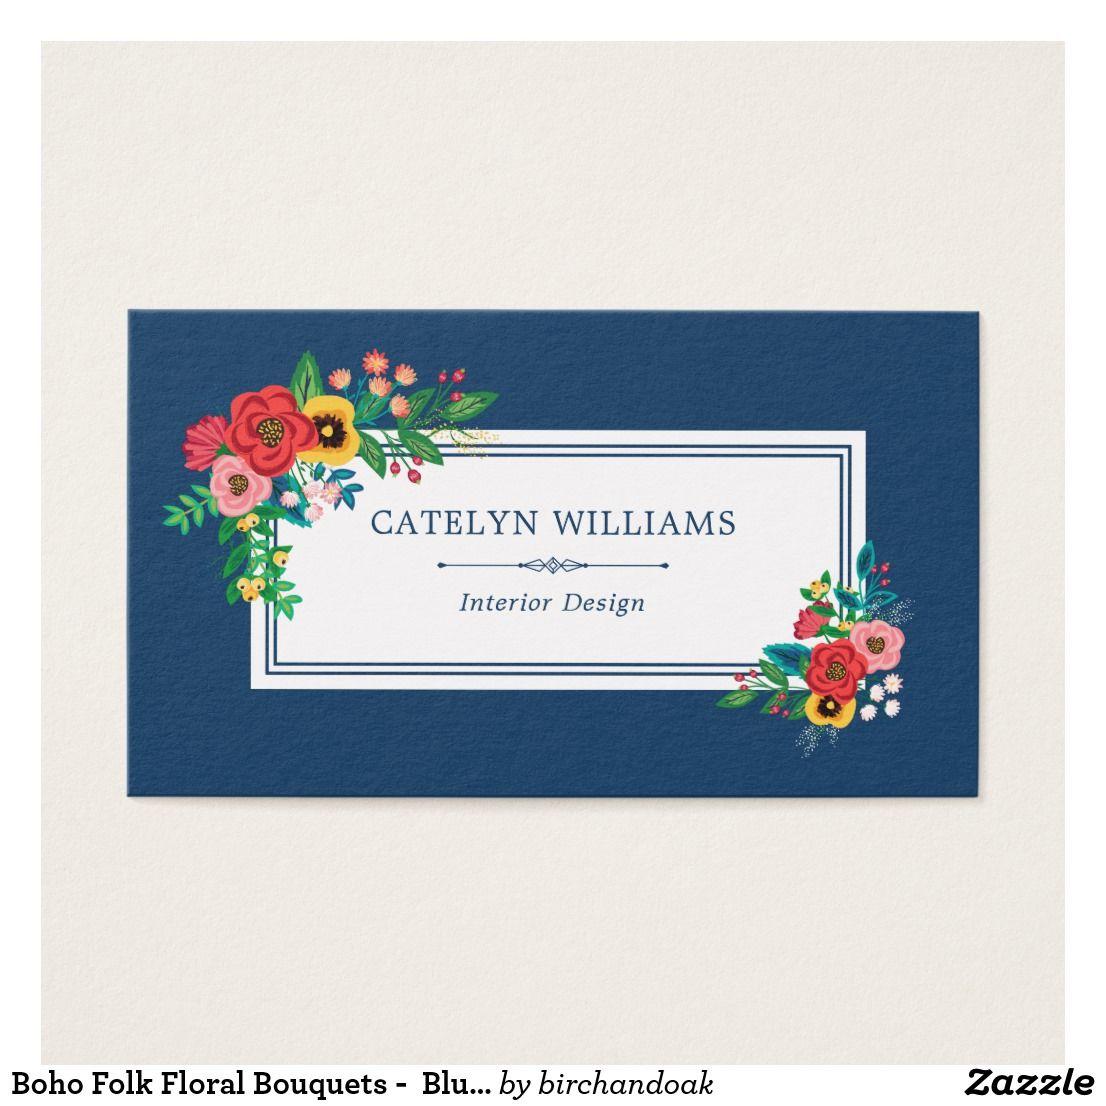 Boho Folk Floral Bouquets Blue White Business Card Business